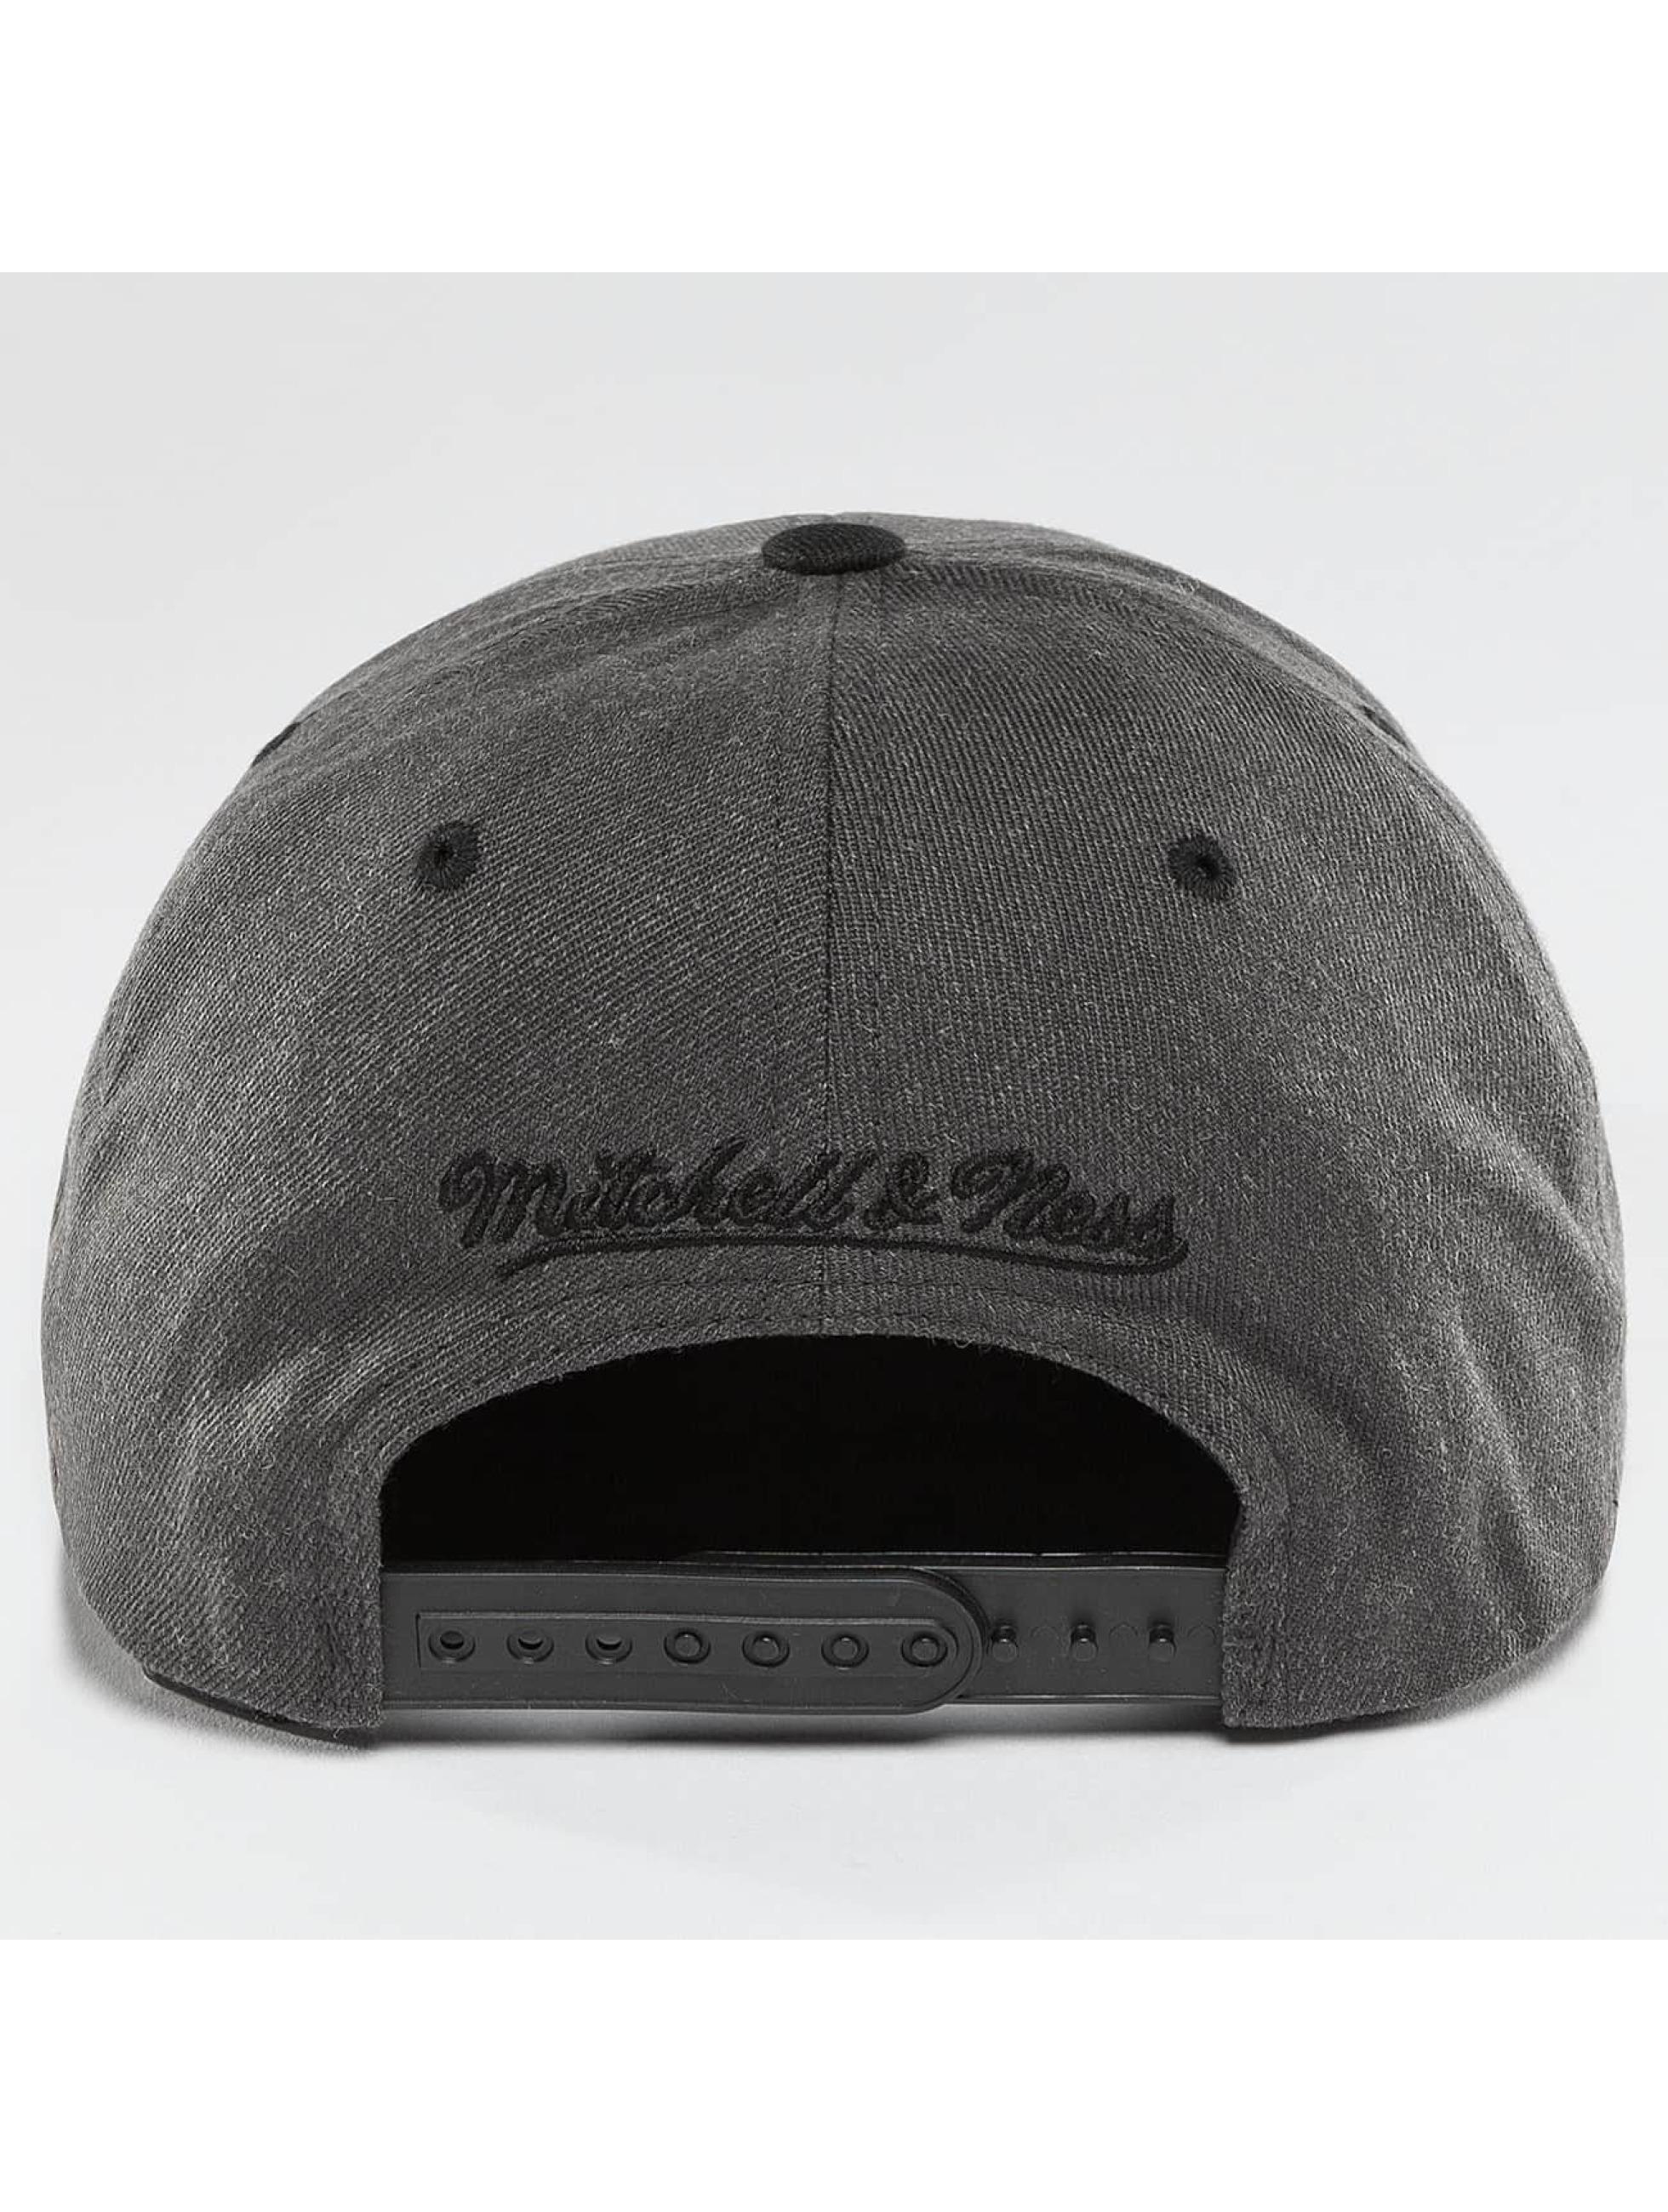 Mitchell & Ness Casquette Snapback & Strapback 2-Tone gris